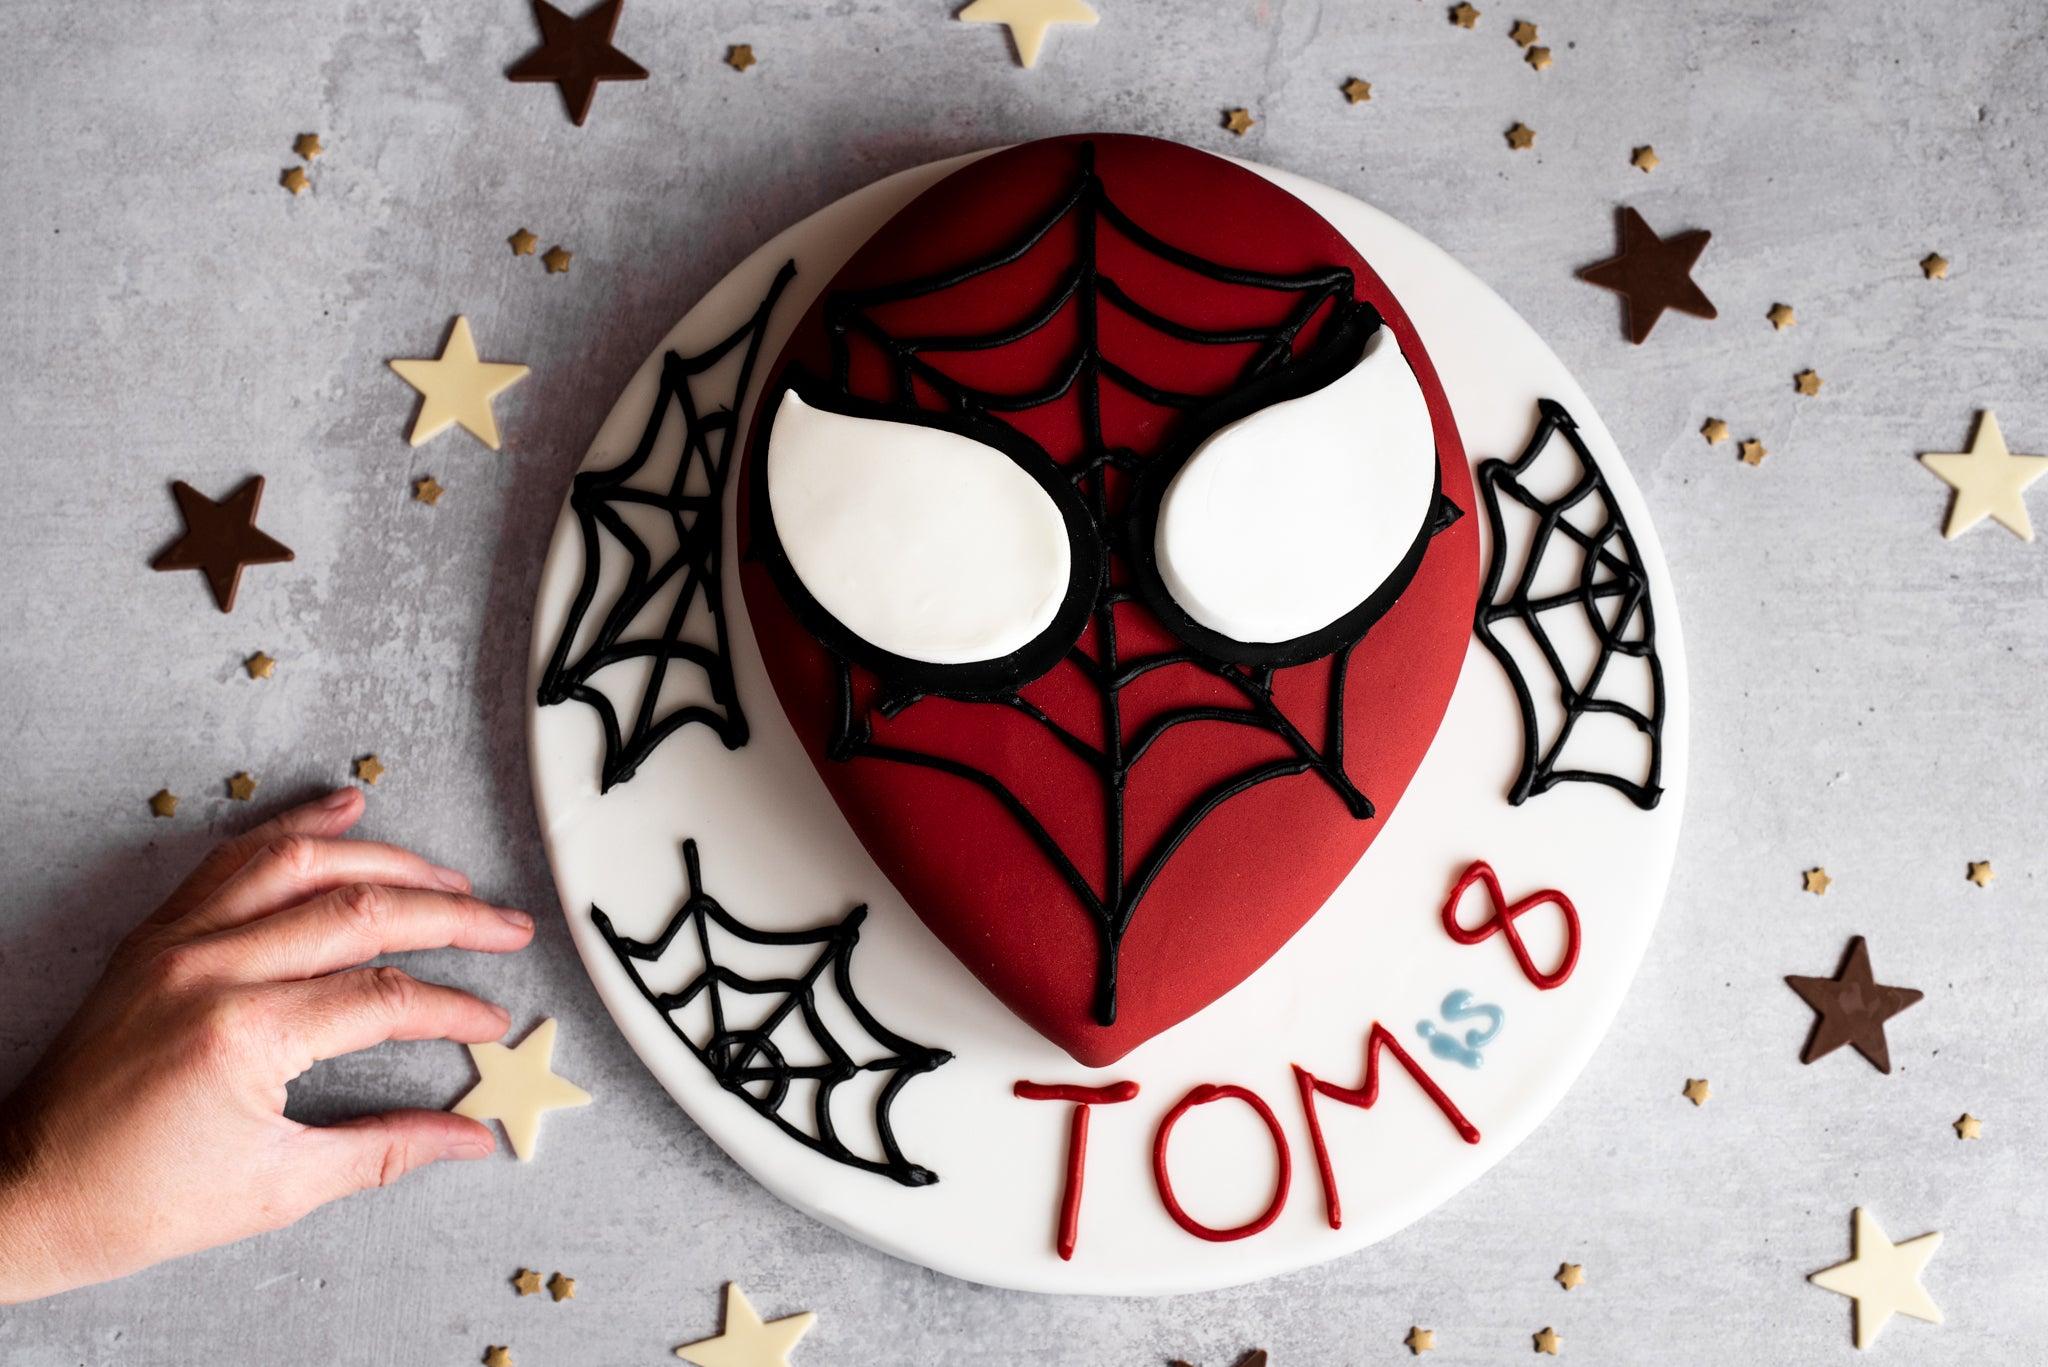 Spiderman-Cake-WEB-RES-4.jpg